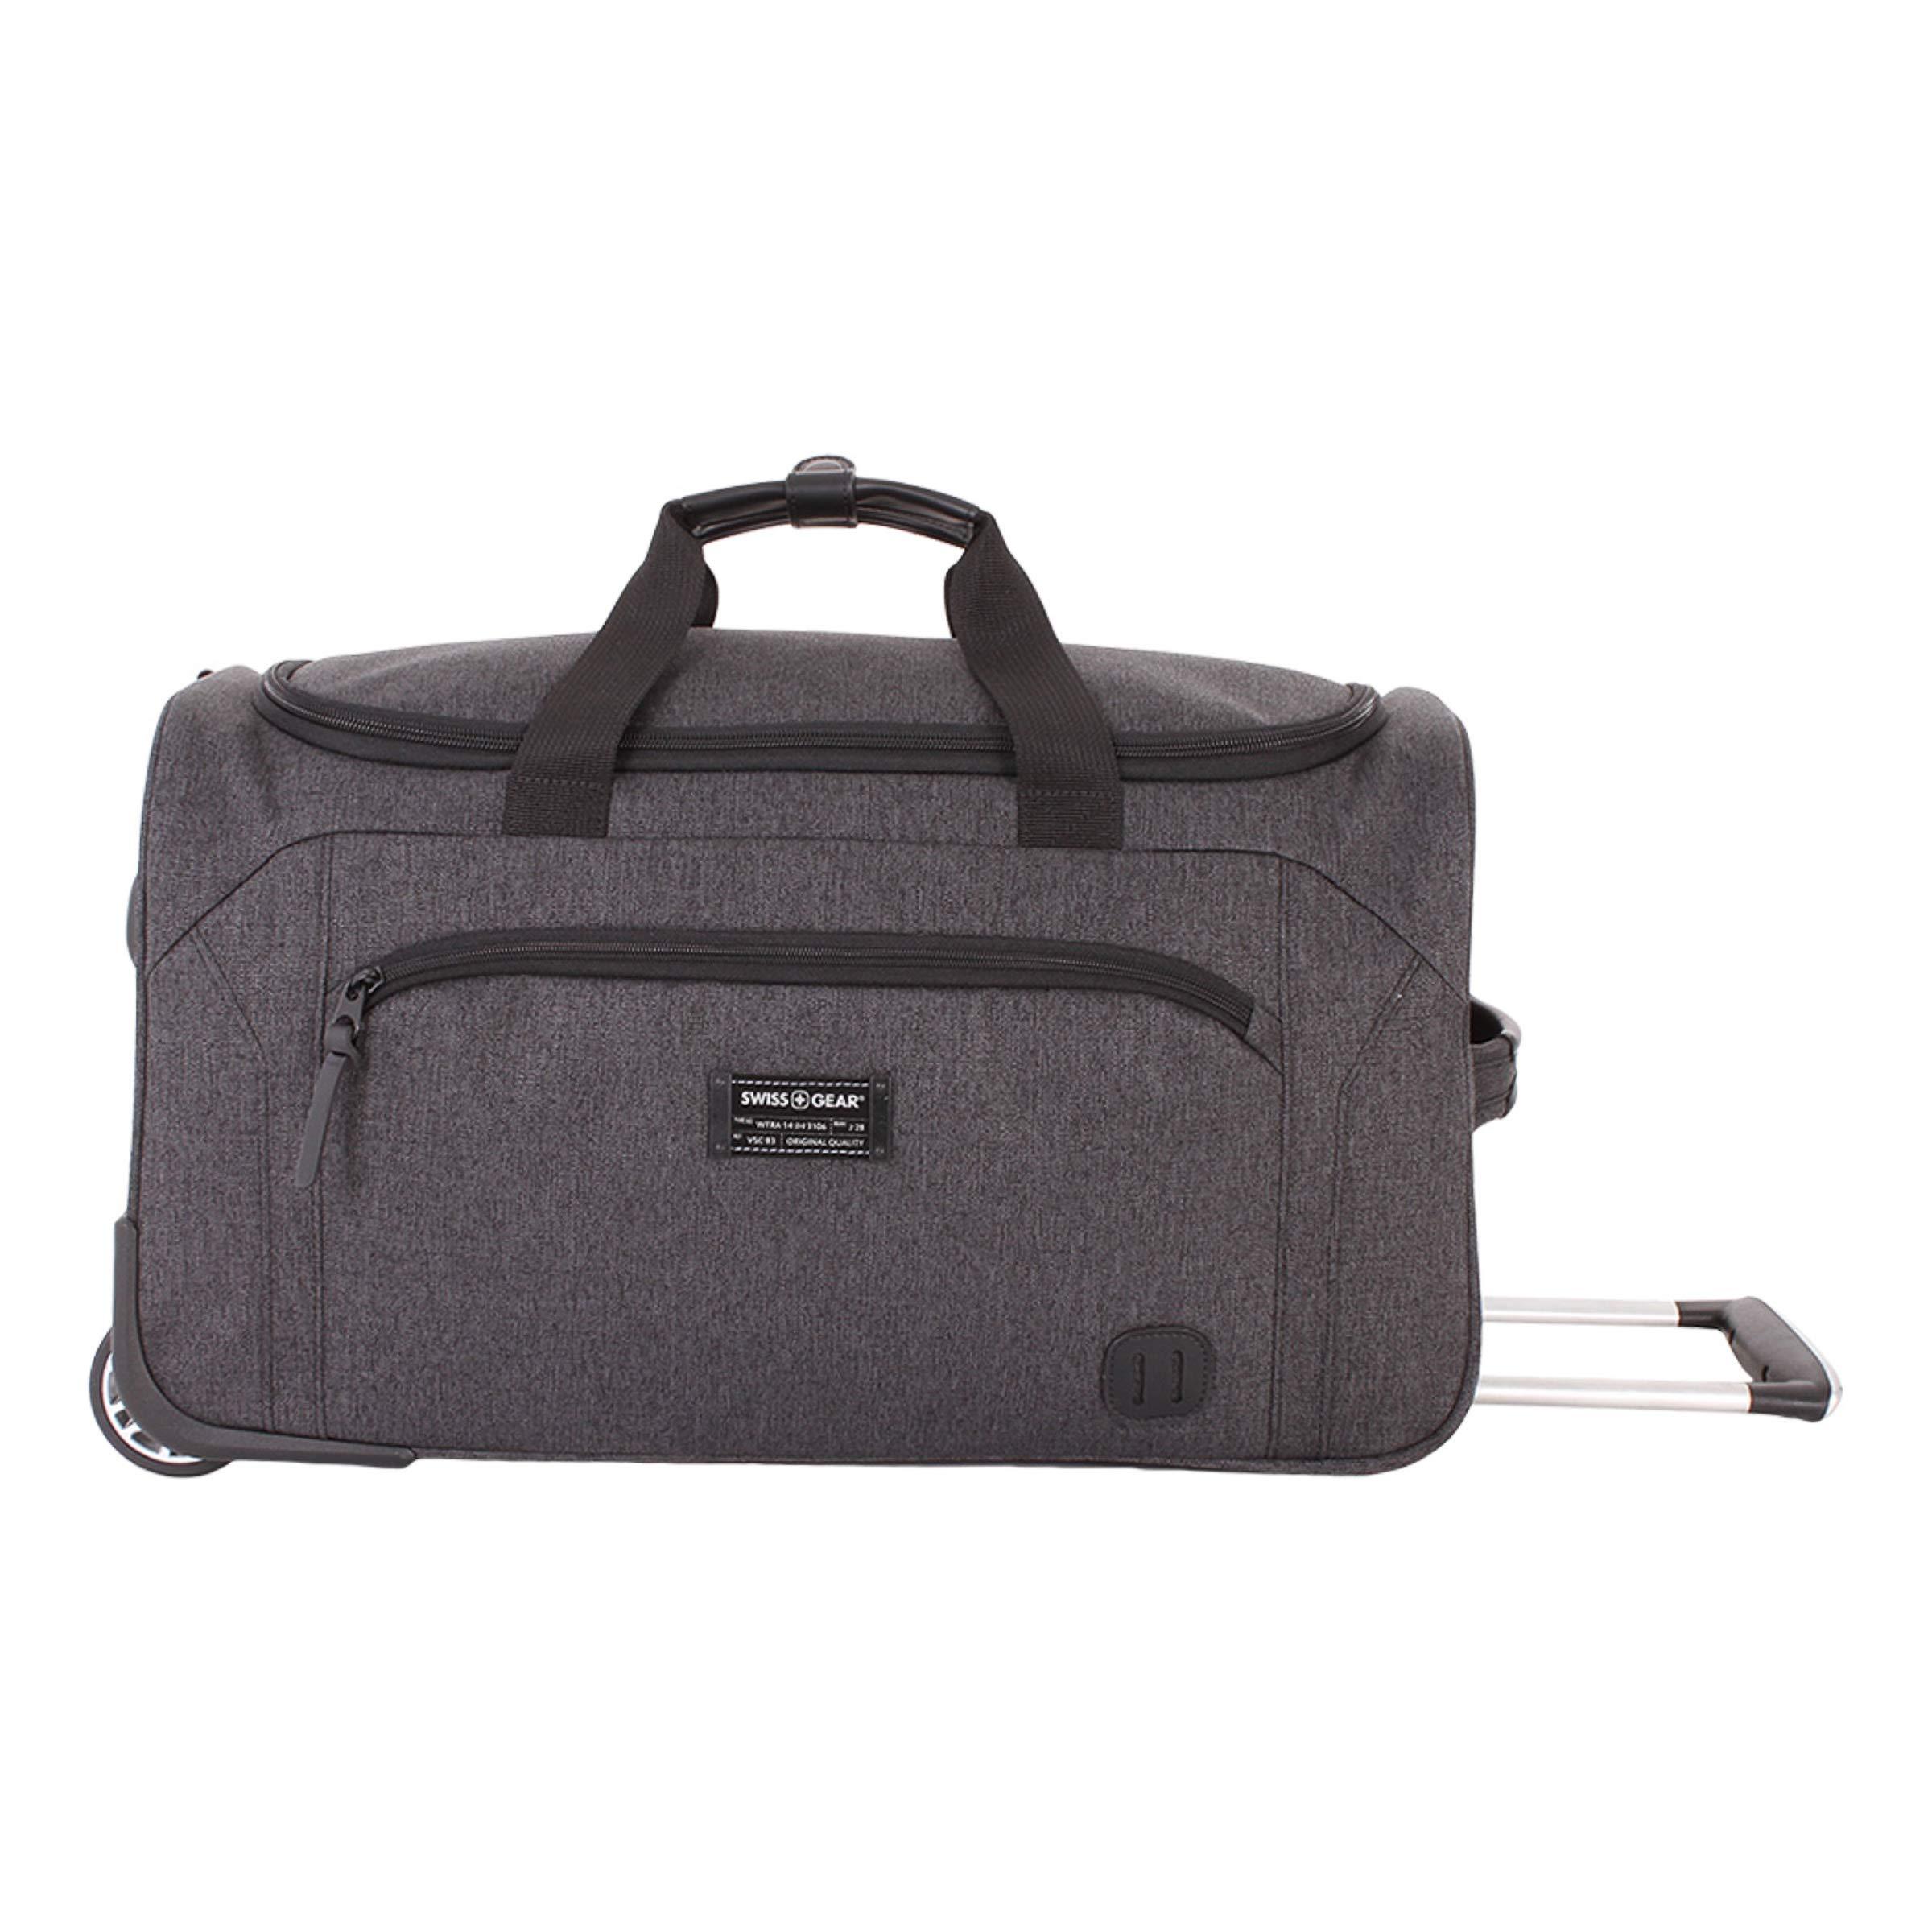 SWISSGEAR Getaway Weekend Wheeled 19-inch Duffel Bag   Rolling Travel Luggage   Men's and Women's - Dark Gray